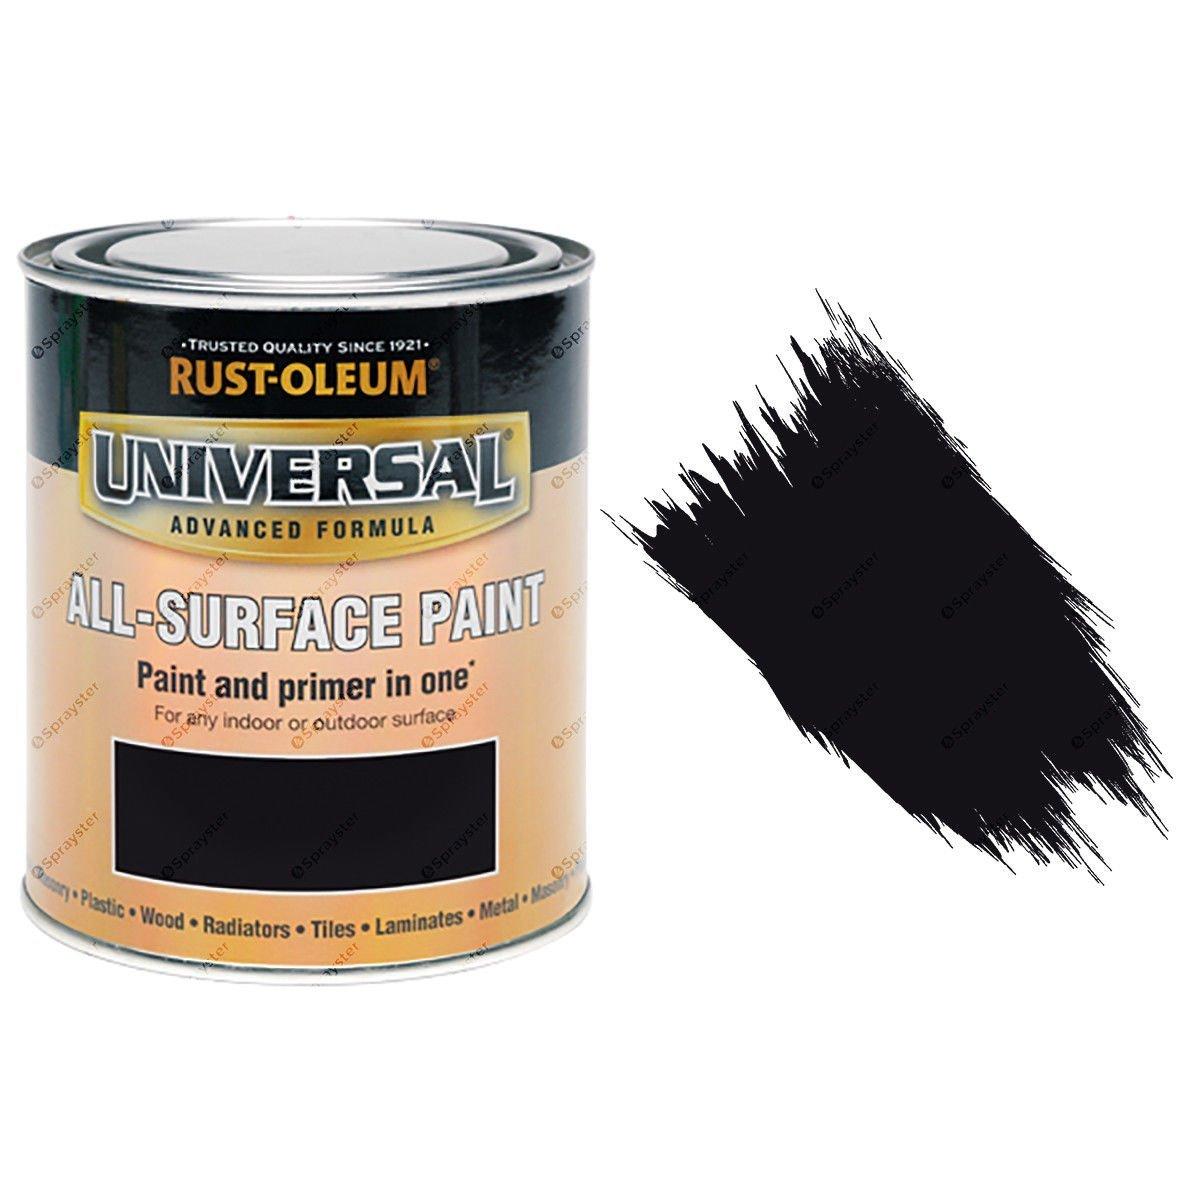 Rust-Oleum-Universal-All-Surface-Self-Primer-Brush-Paint-Matt-Black-250ml-372229925941